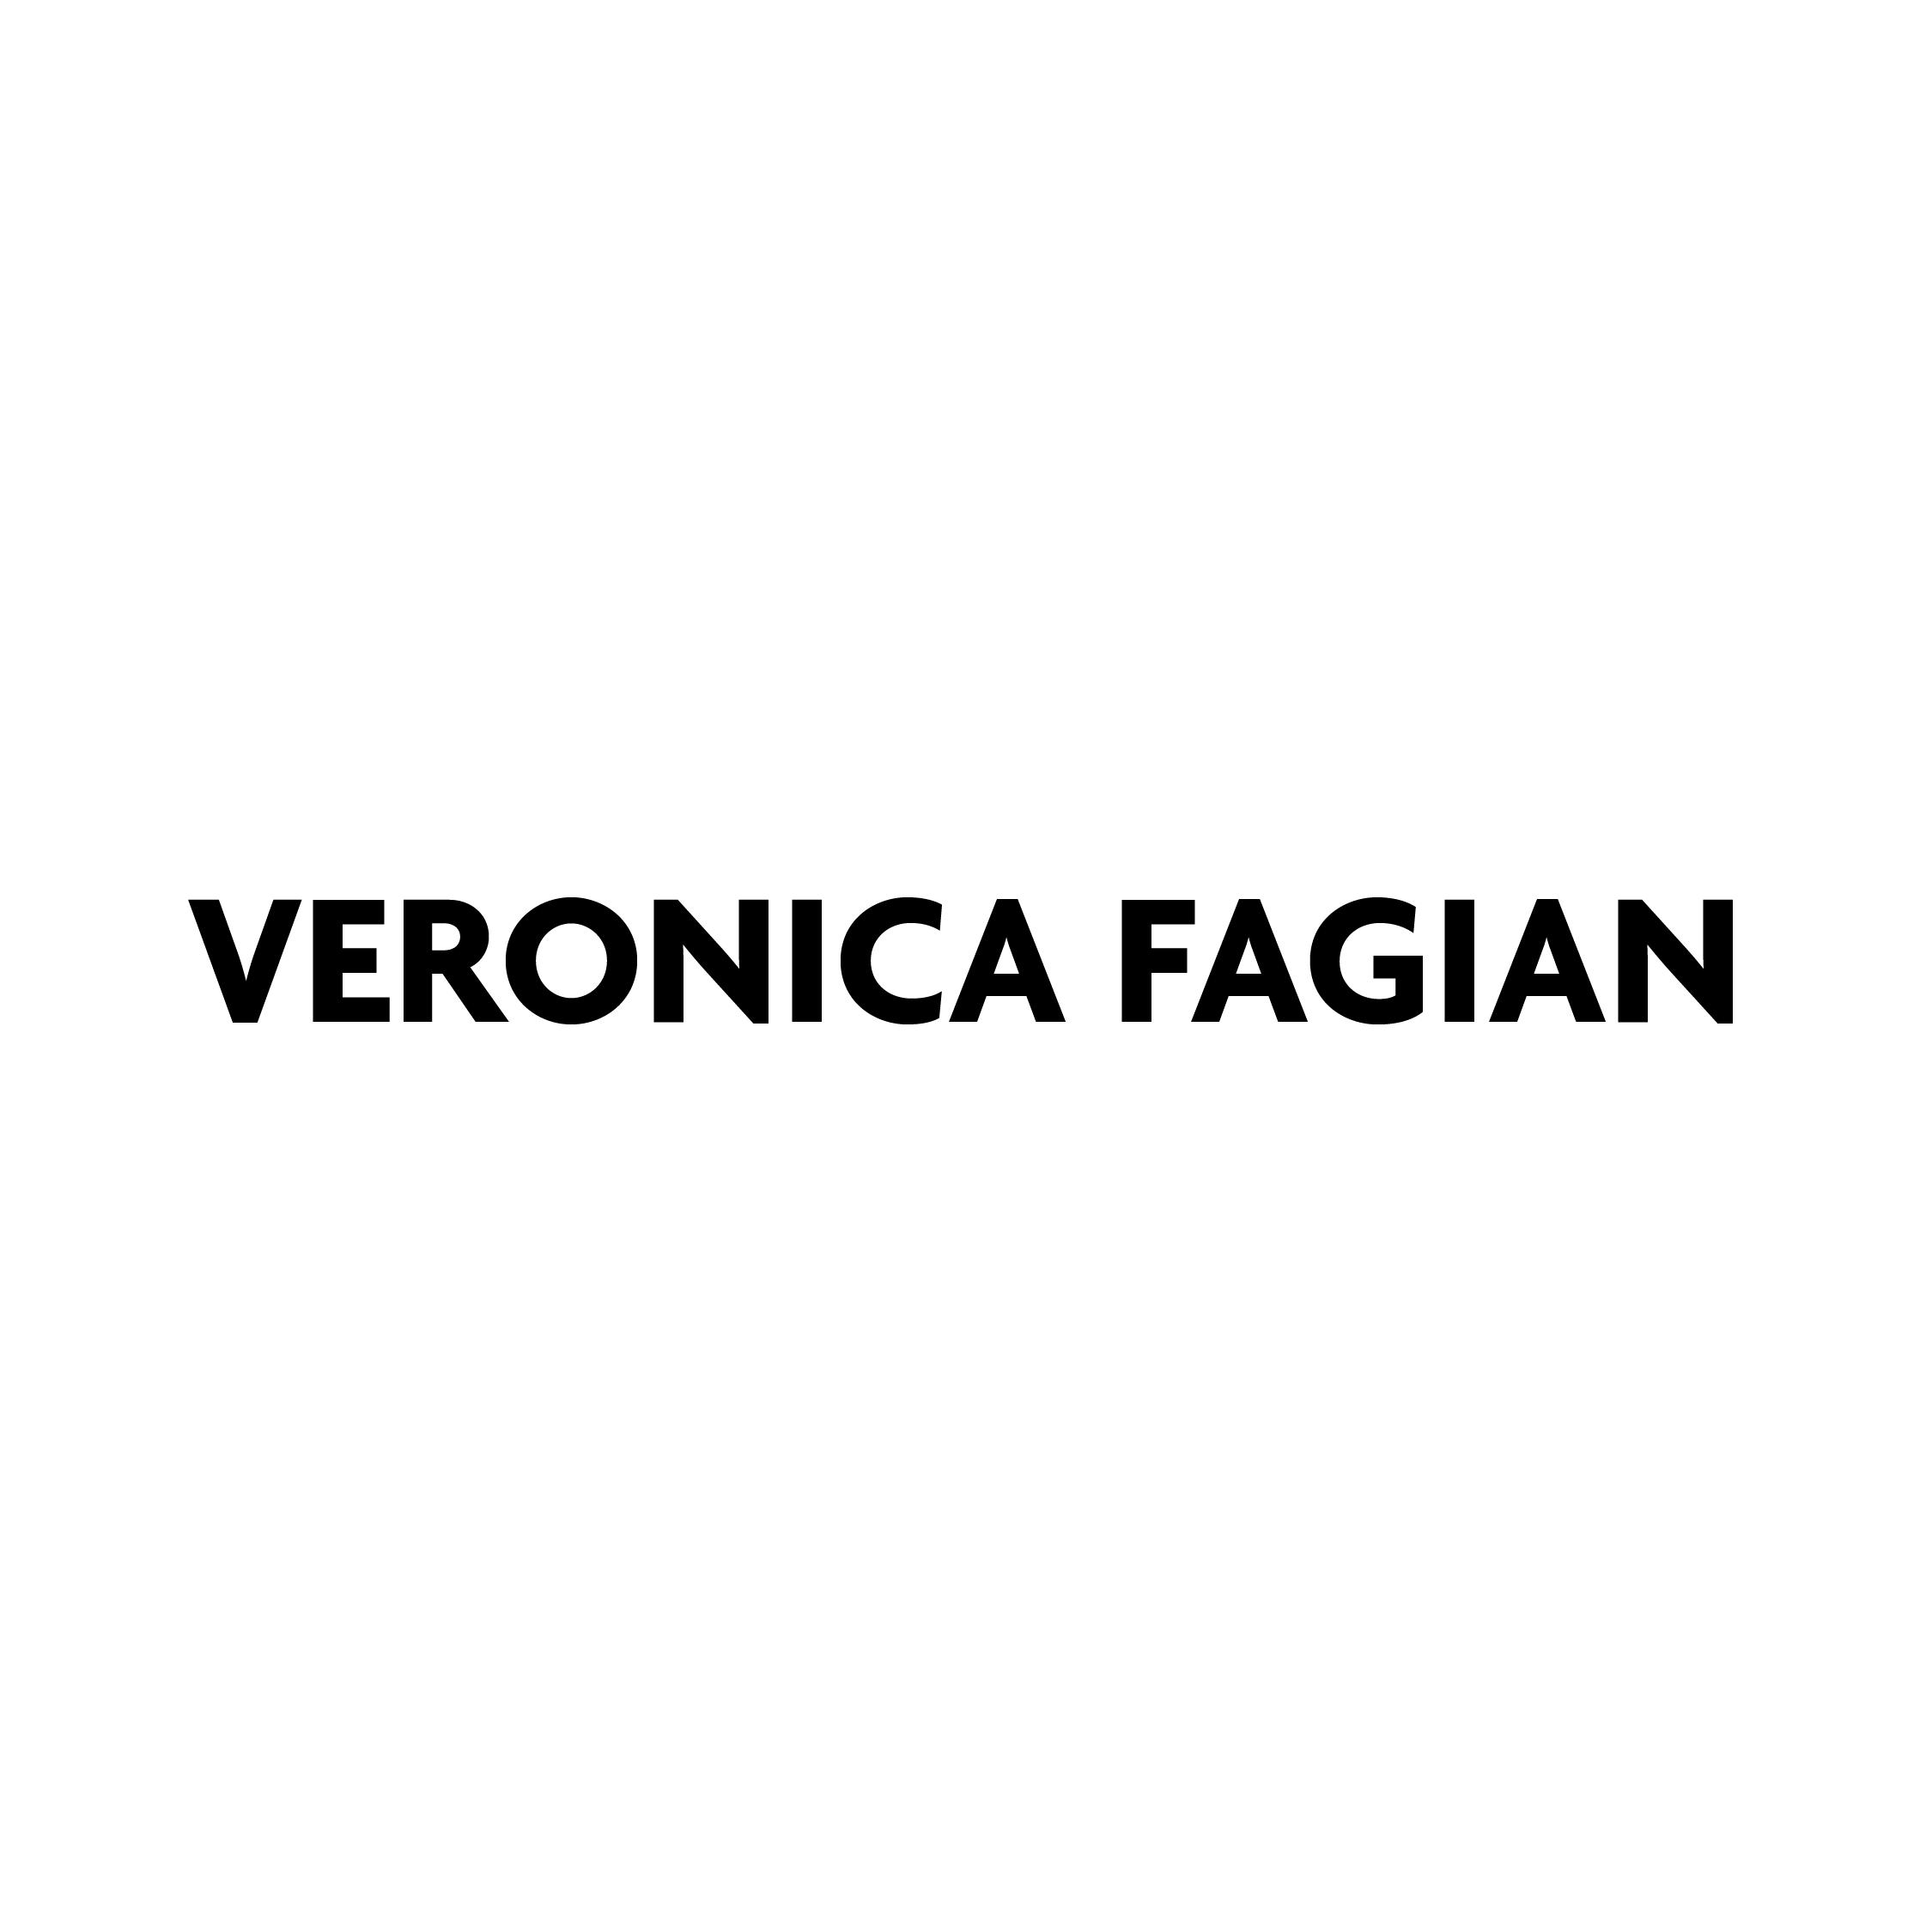 Veronica Fagian